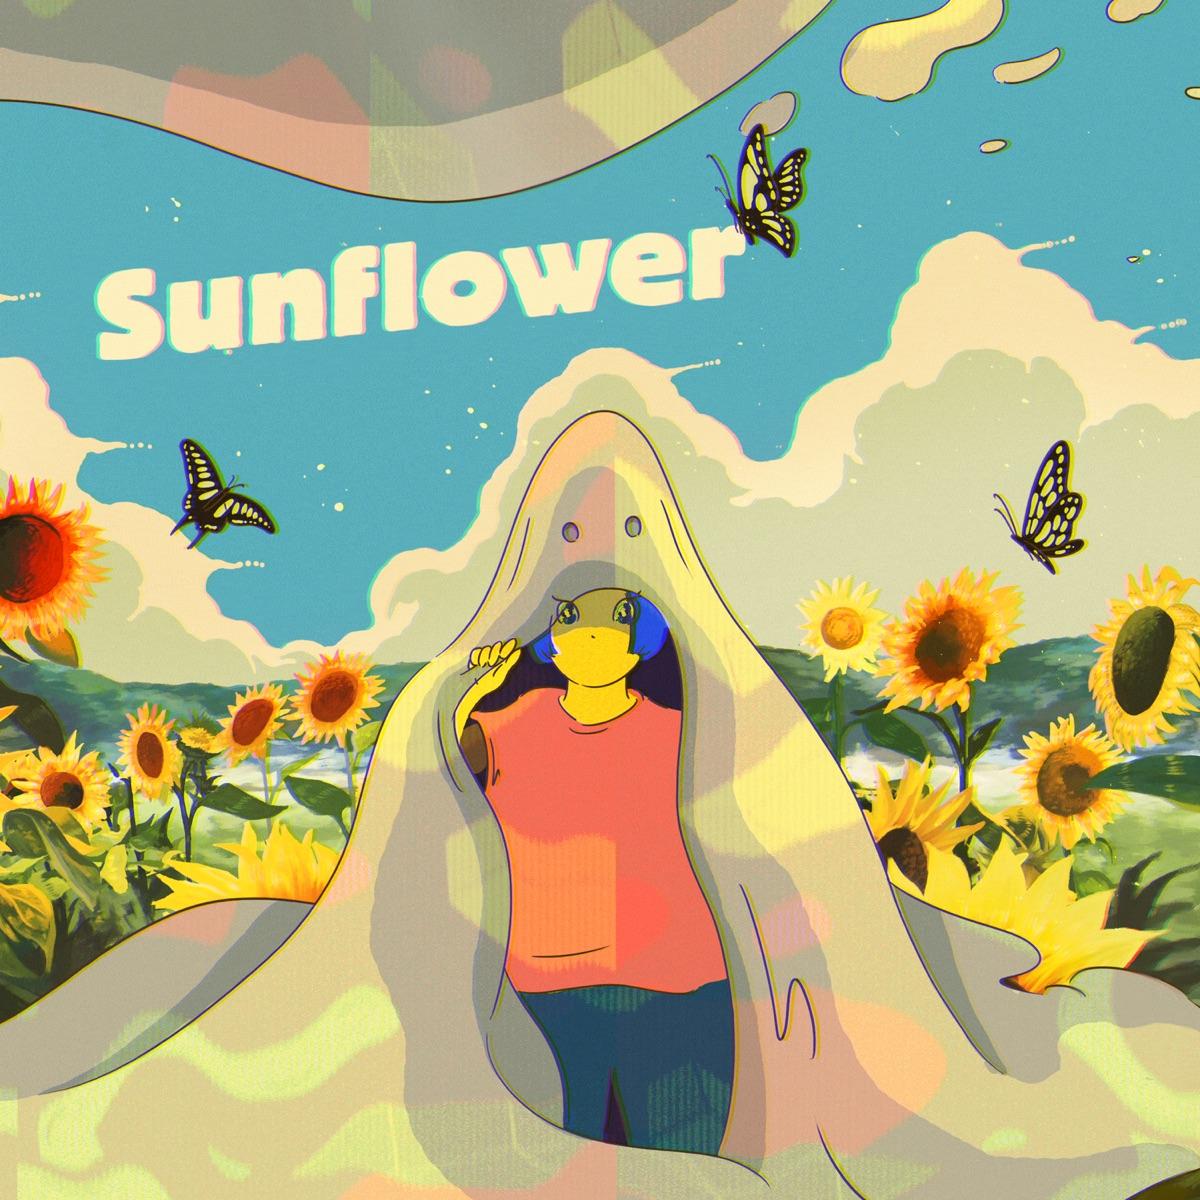 『HoneyComeBear - Sunflower』収録の『Sunflower』ジャケット